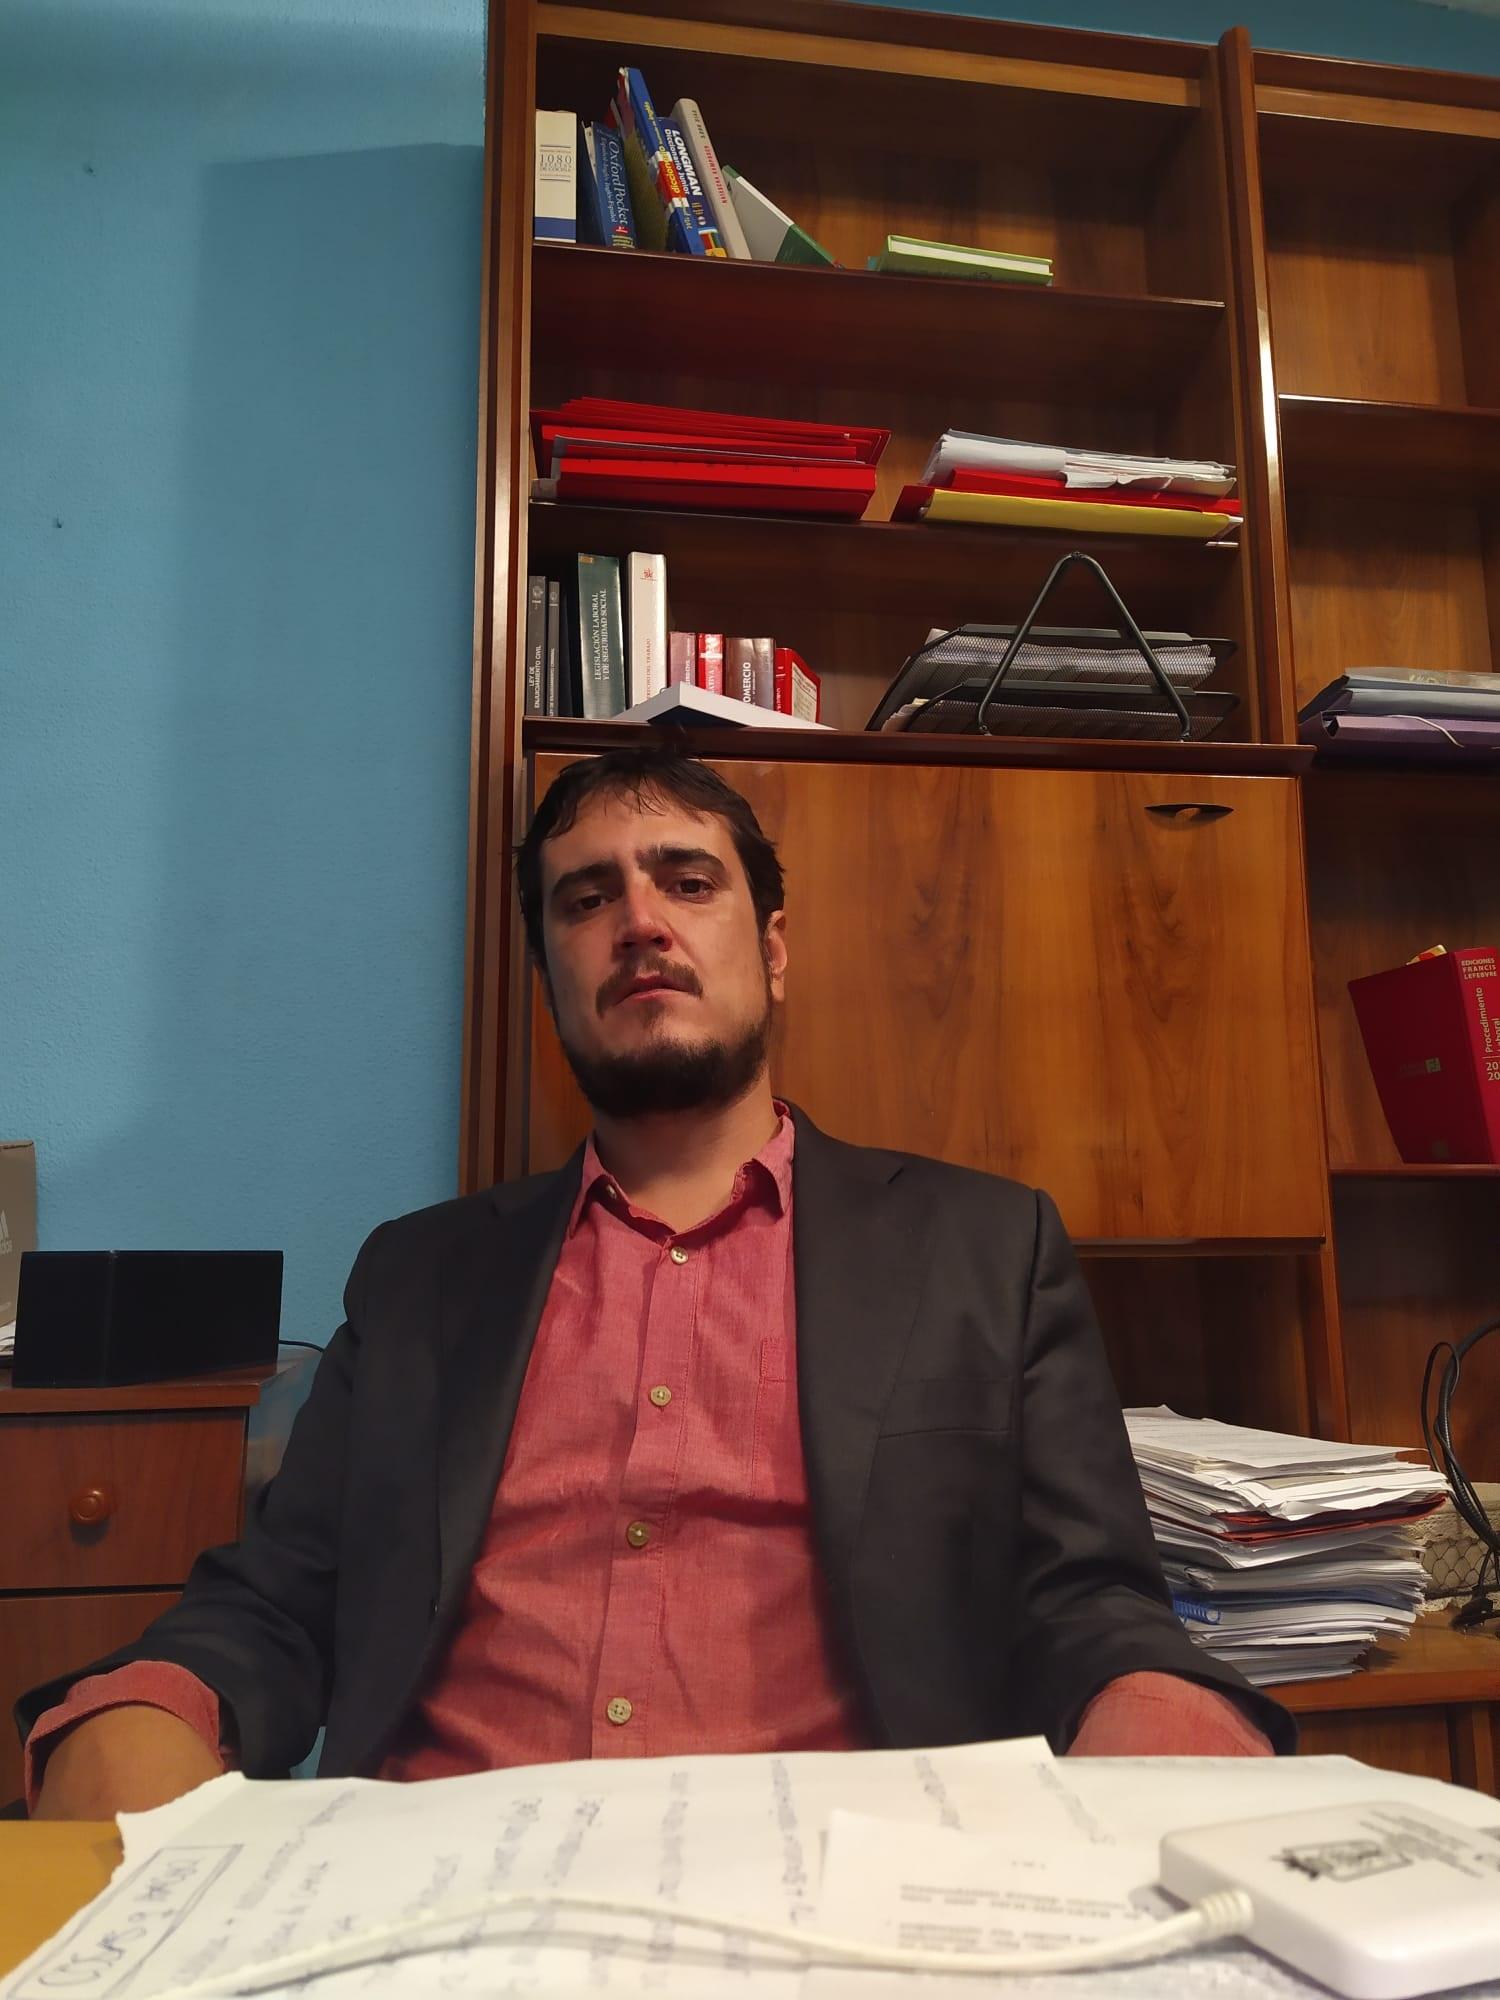 Juan Antonio Jiménez-Piernas García